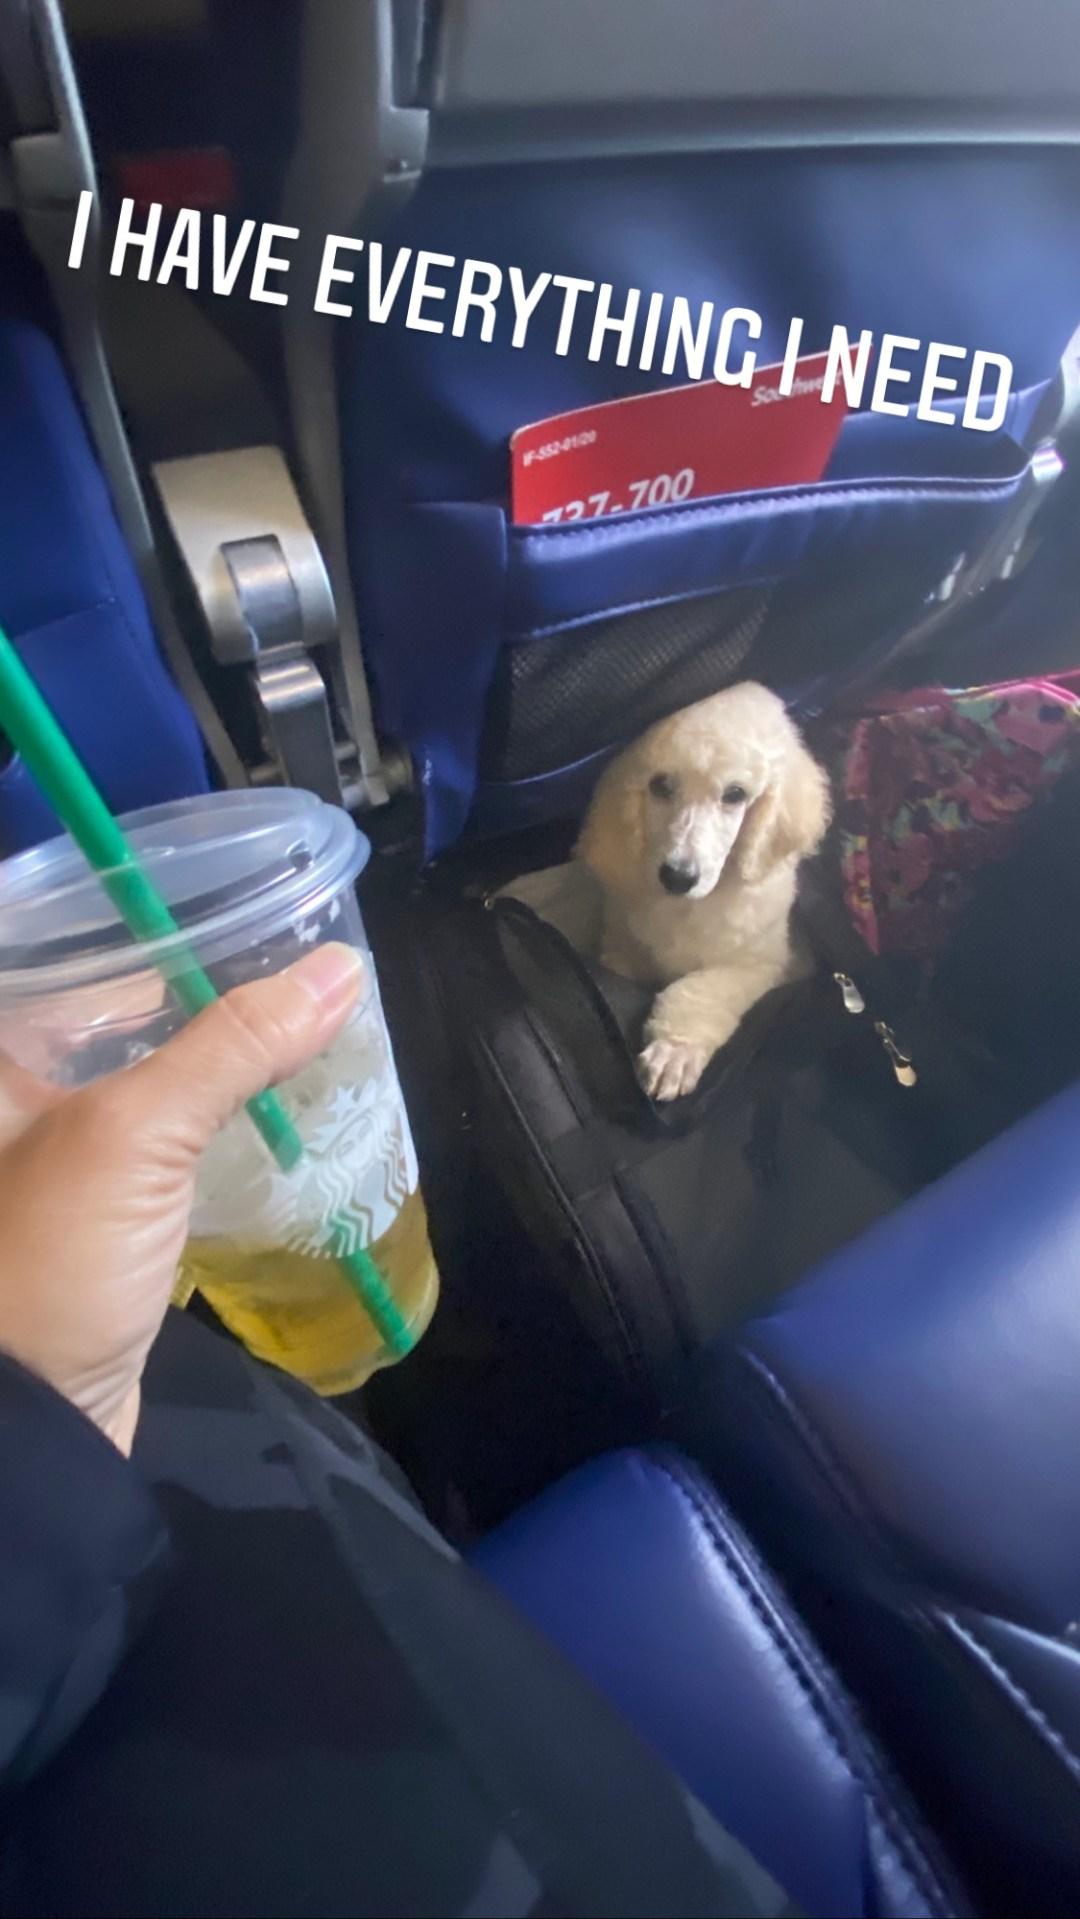 Flight Pet Nanny transporting a Poodle Puppy